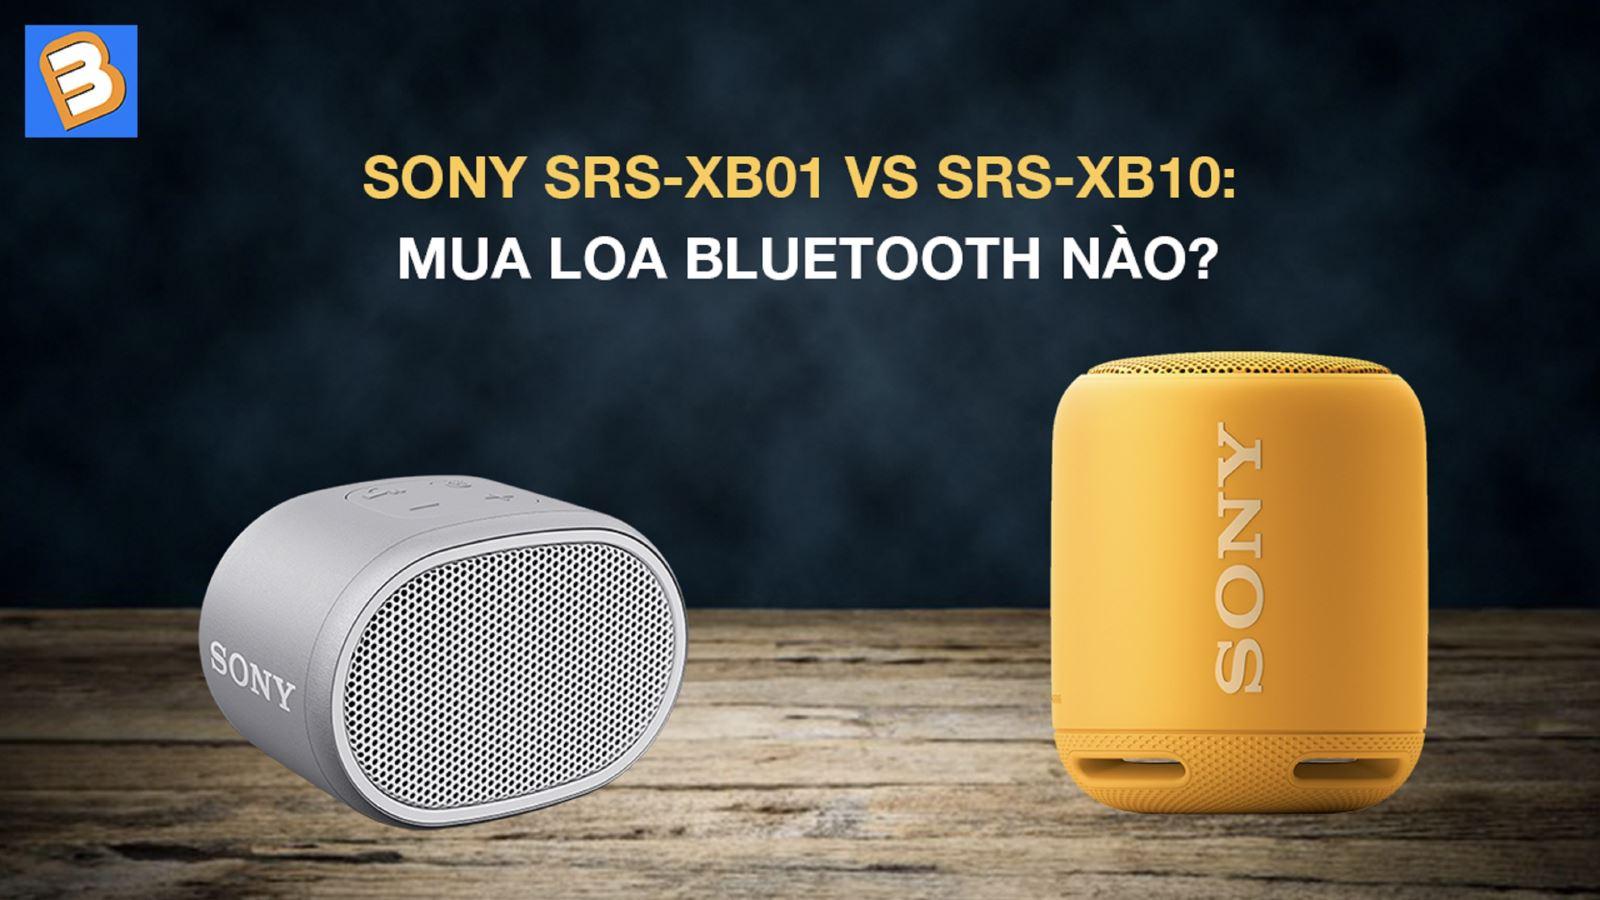 Sony SRS-XB01 vsSRS-XB10: mua loa bluetooth nào?